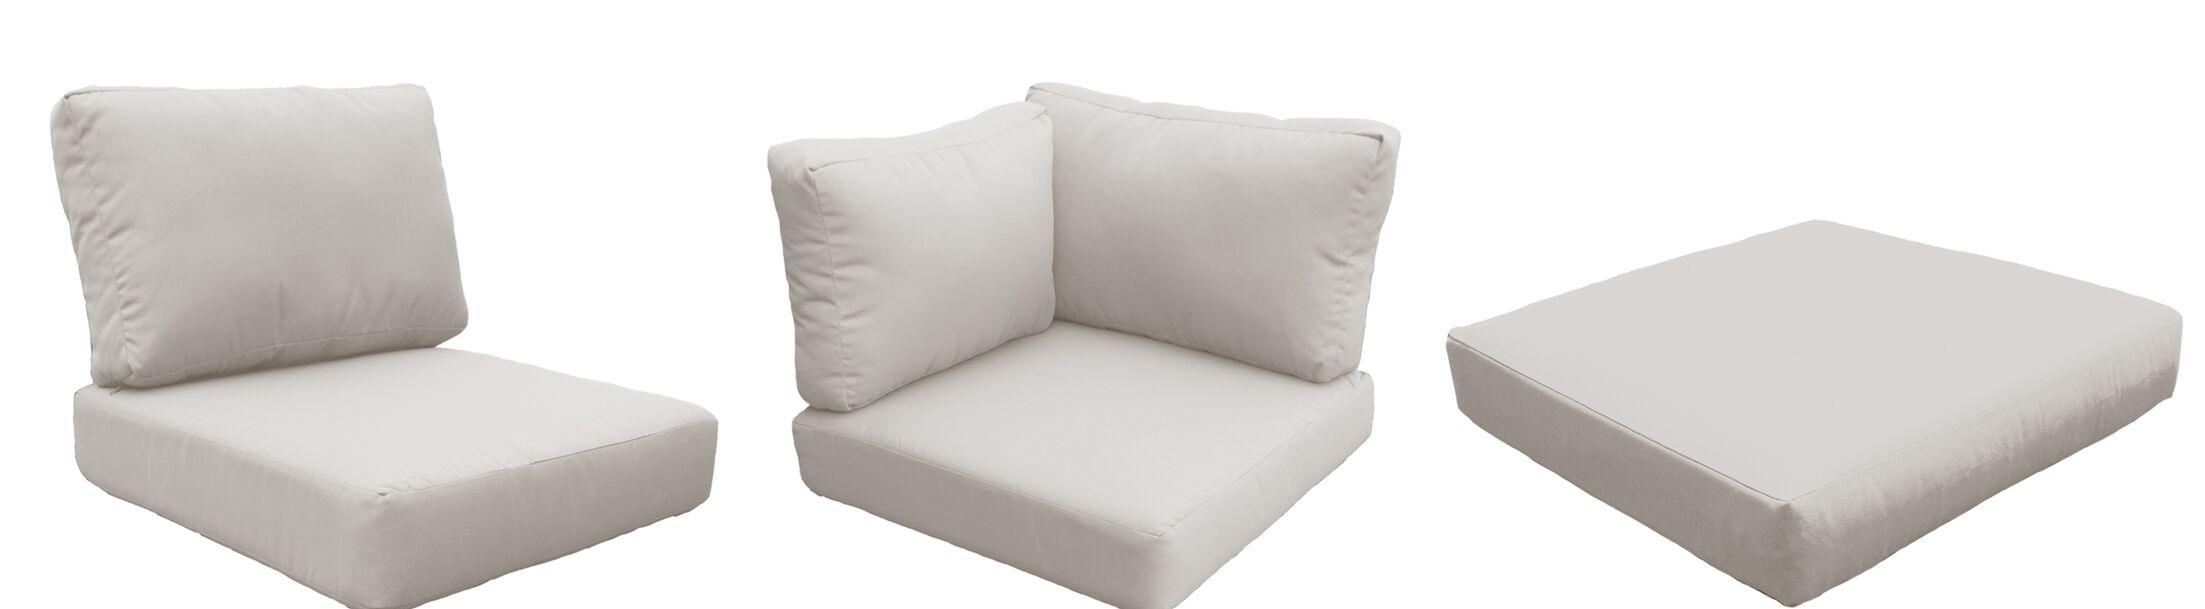 Fairmont 12 Piece Outdoor�Lounge Chair Cushion Set Fabric: Beige